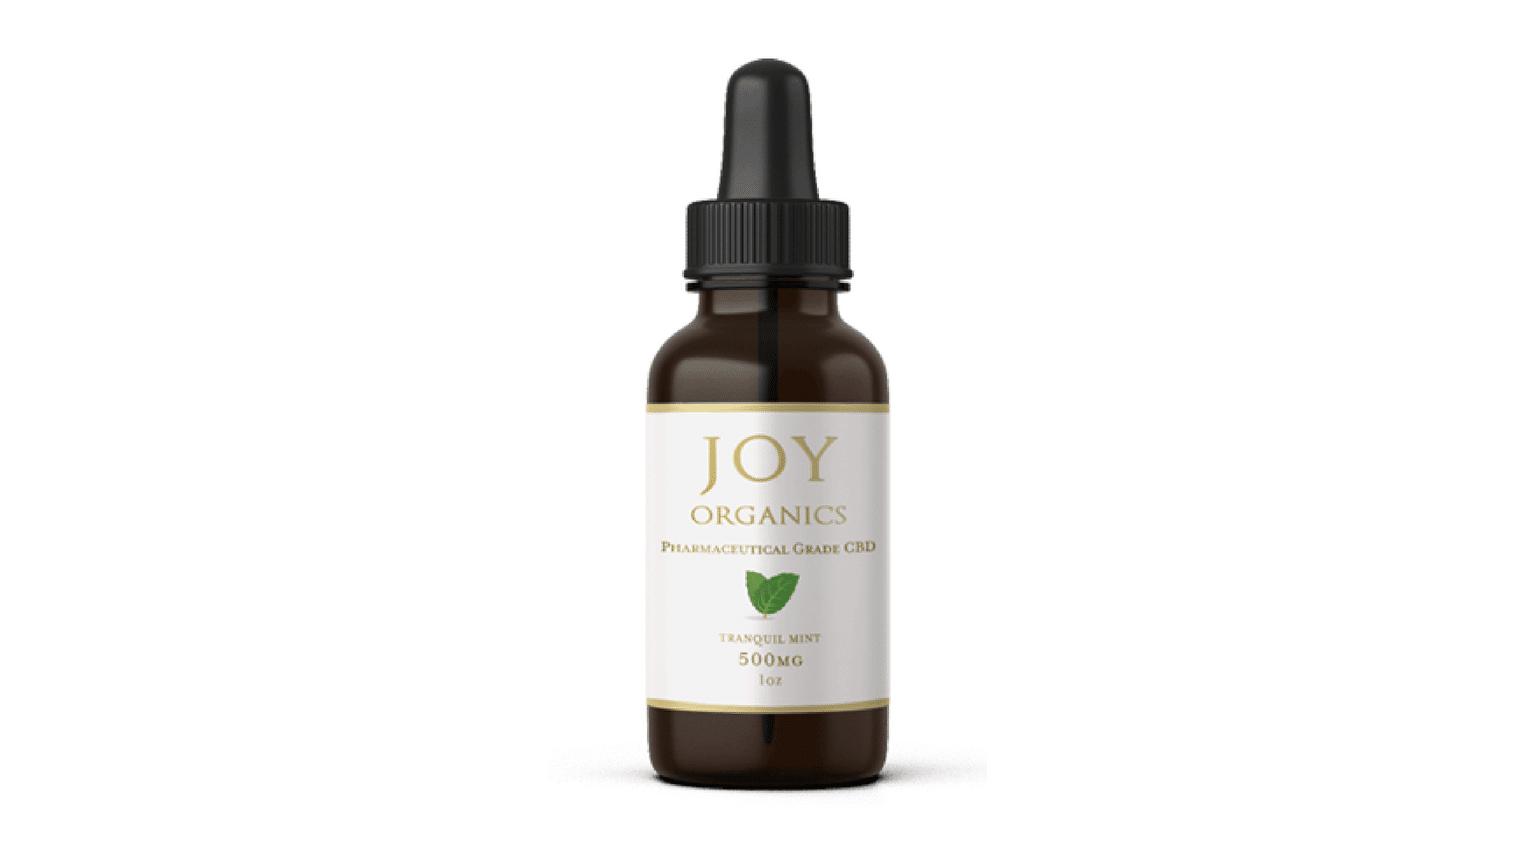 joy-organics-cbd-tincture